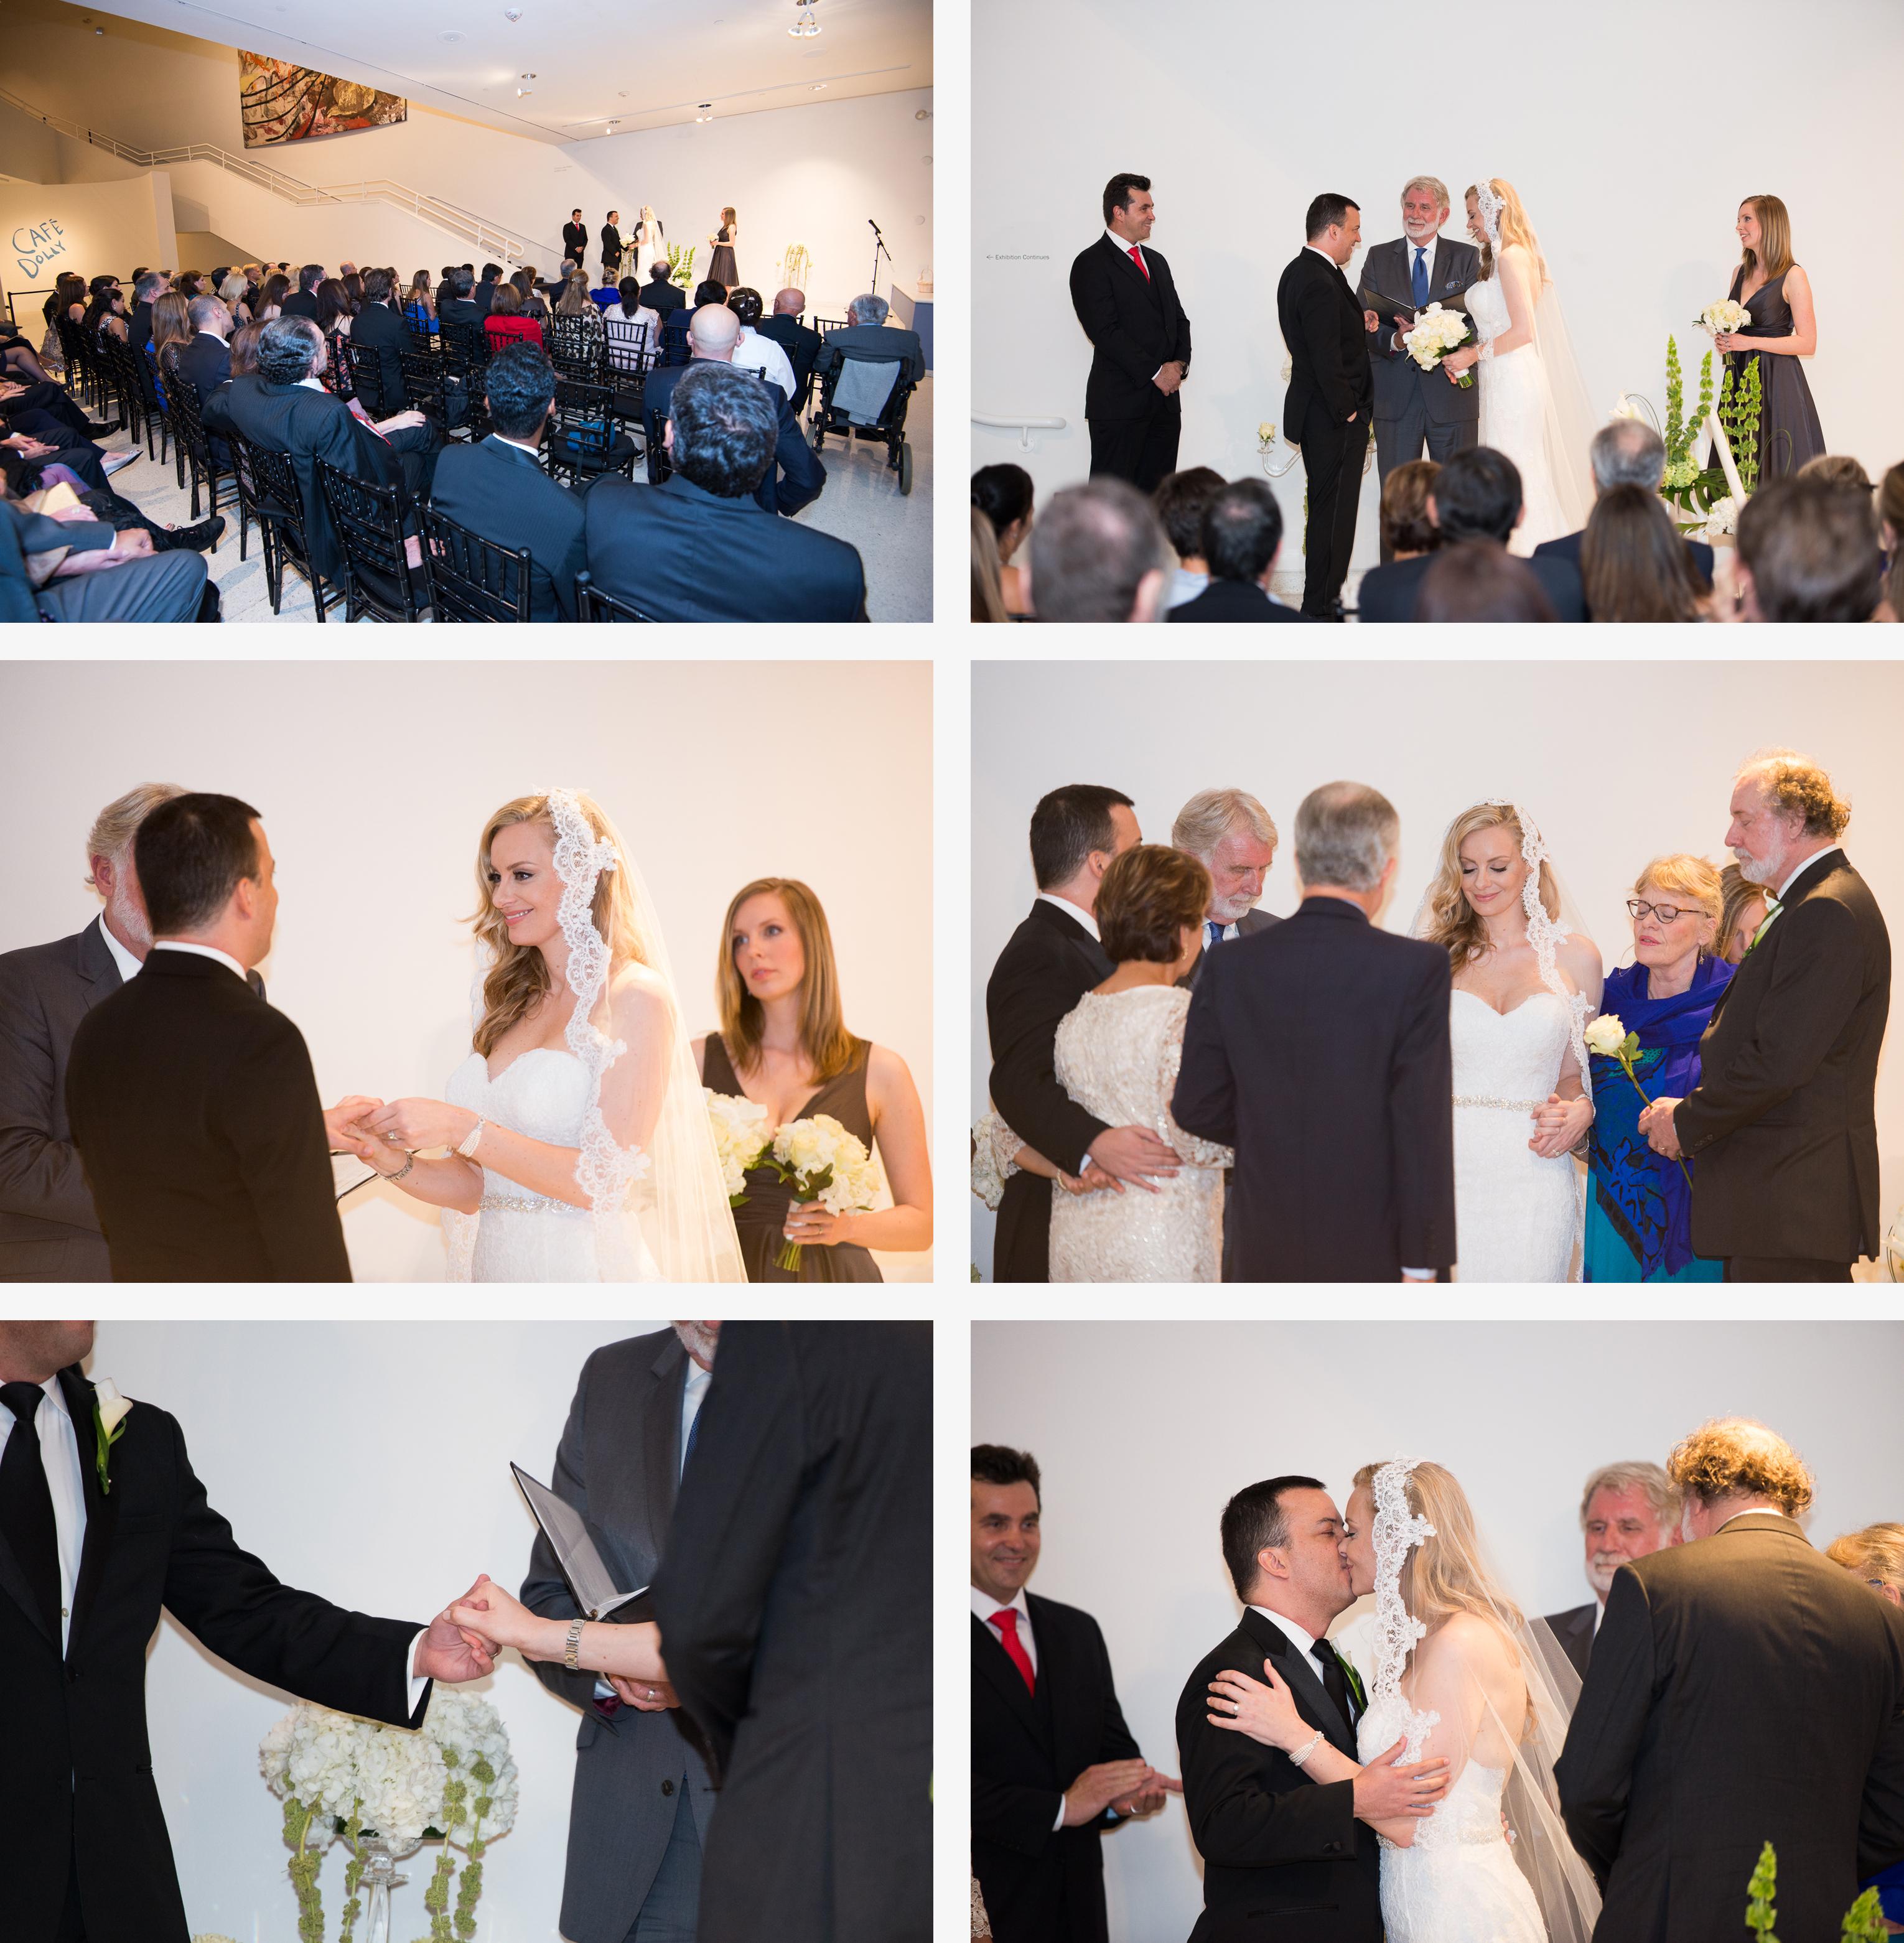 brandwold.se-miami-wedding-fortlauderdale-117